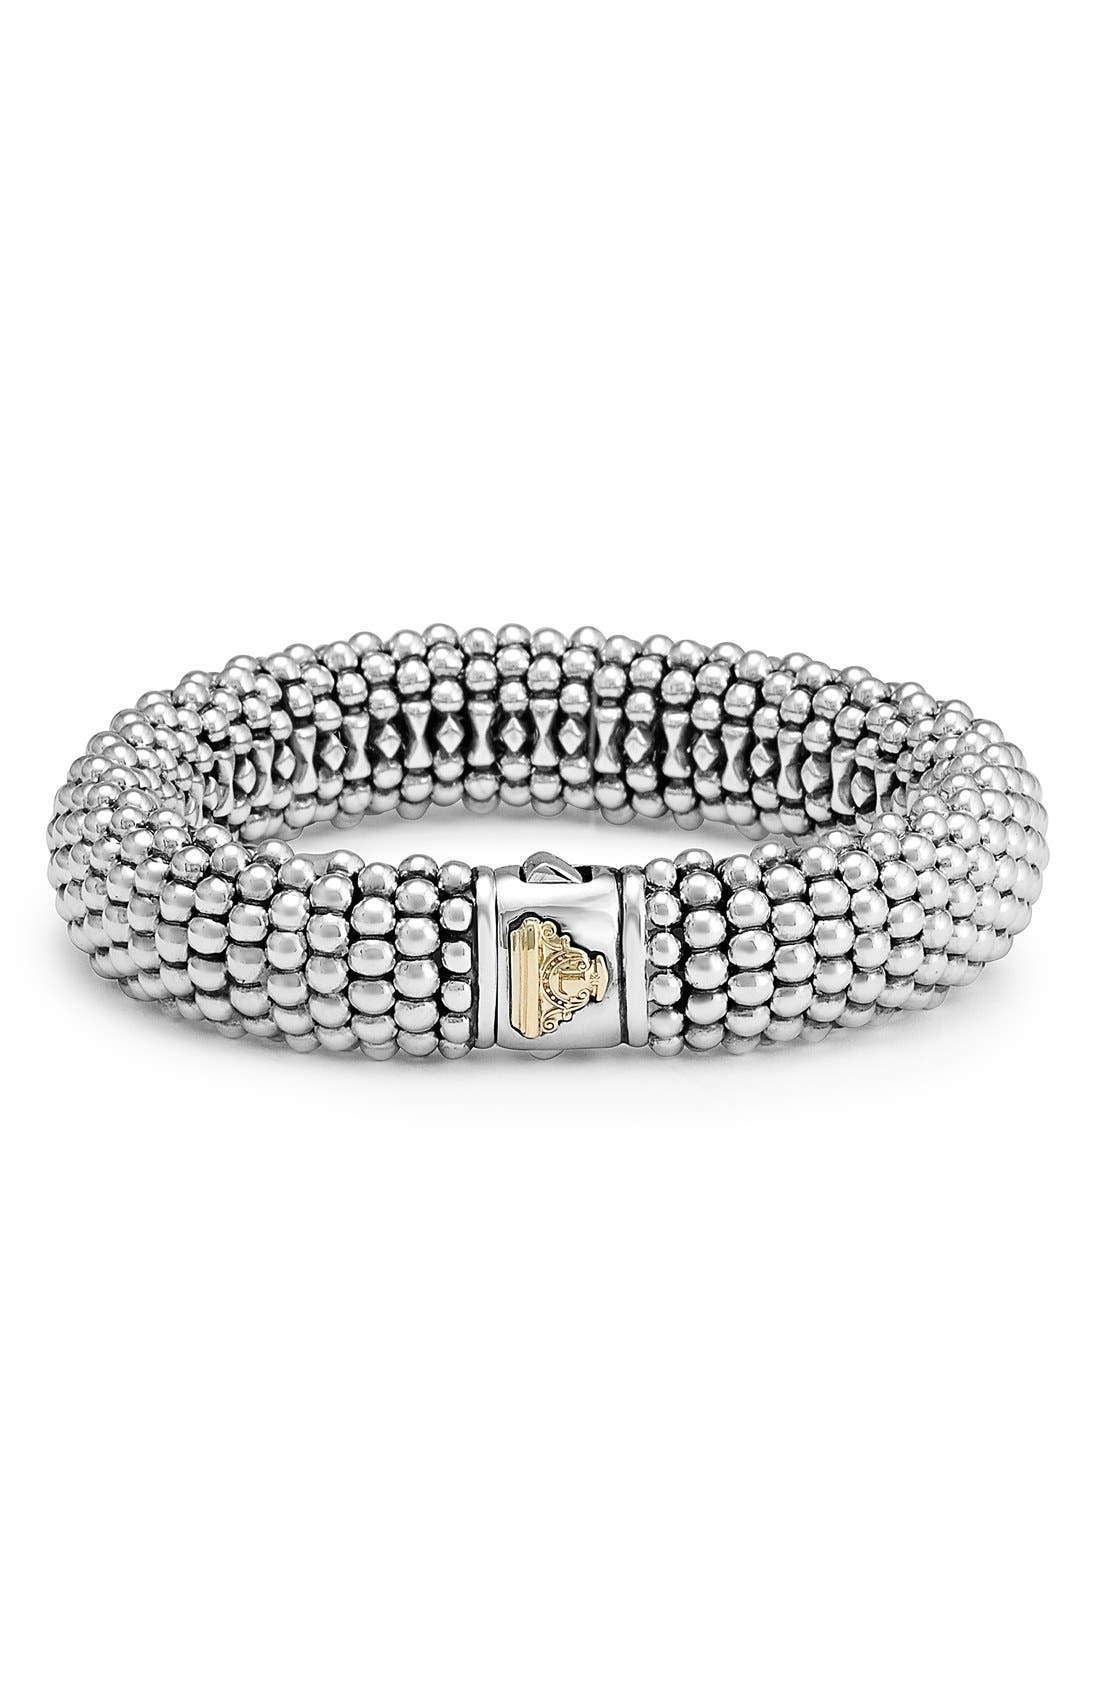 Signature Caviar Wide Rope Bracelet,                             Alternate thumbnail 2, color,                             SILVER/ GOLD